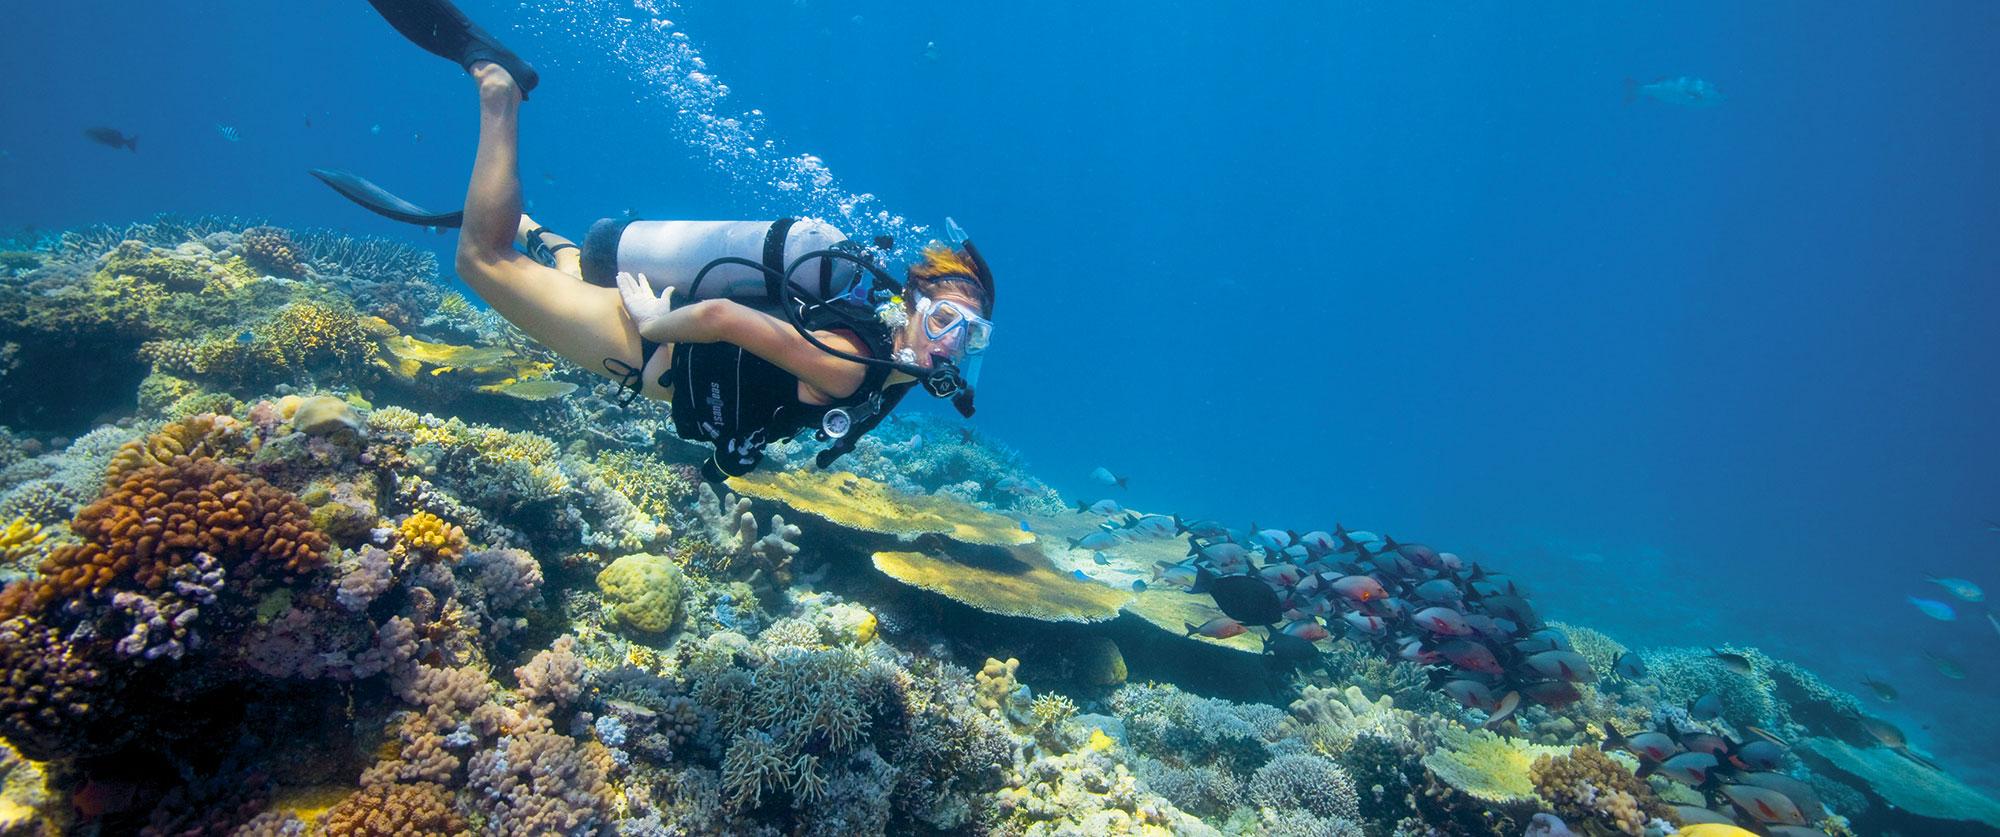 Australia Trip Packages - Great Barrier Reef - Lizard Island Luxury Resort